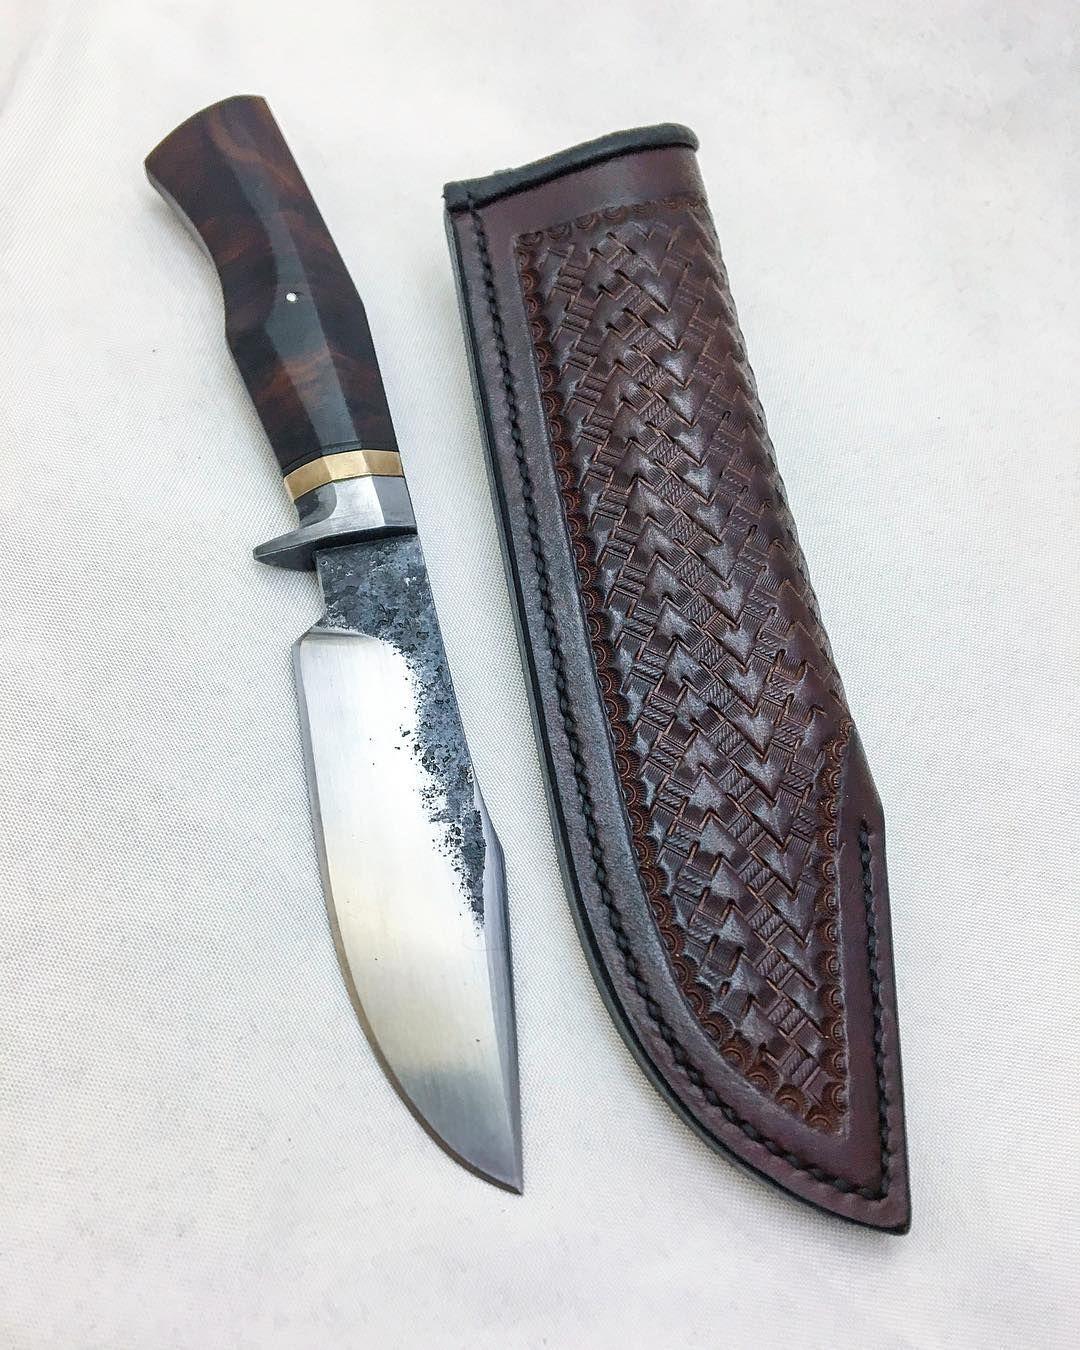 Cruforgev Brut De Forge Blade By Will Stelter Knife Forging Blade